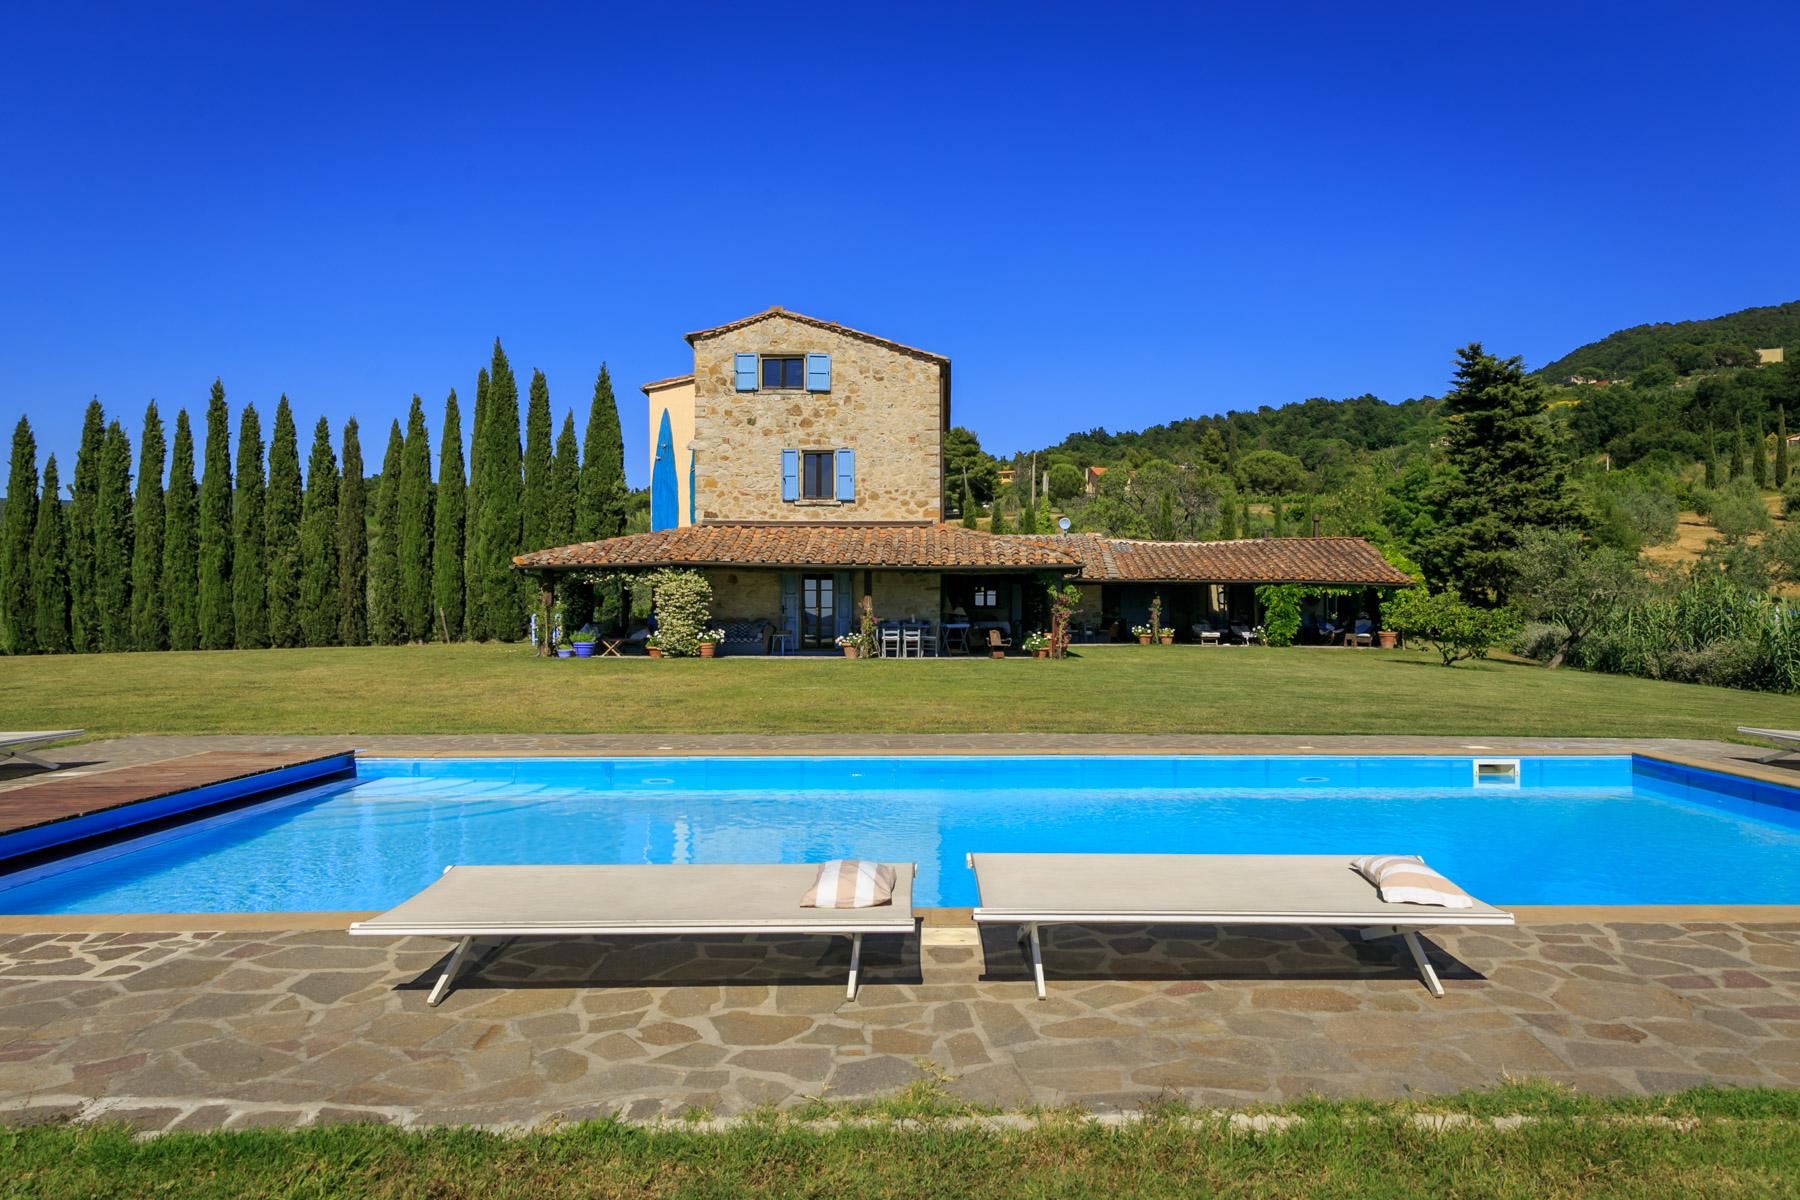 Villa in Vendita a Santa Luce:  5 locali, 270 mq  - Foto 1